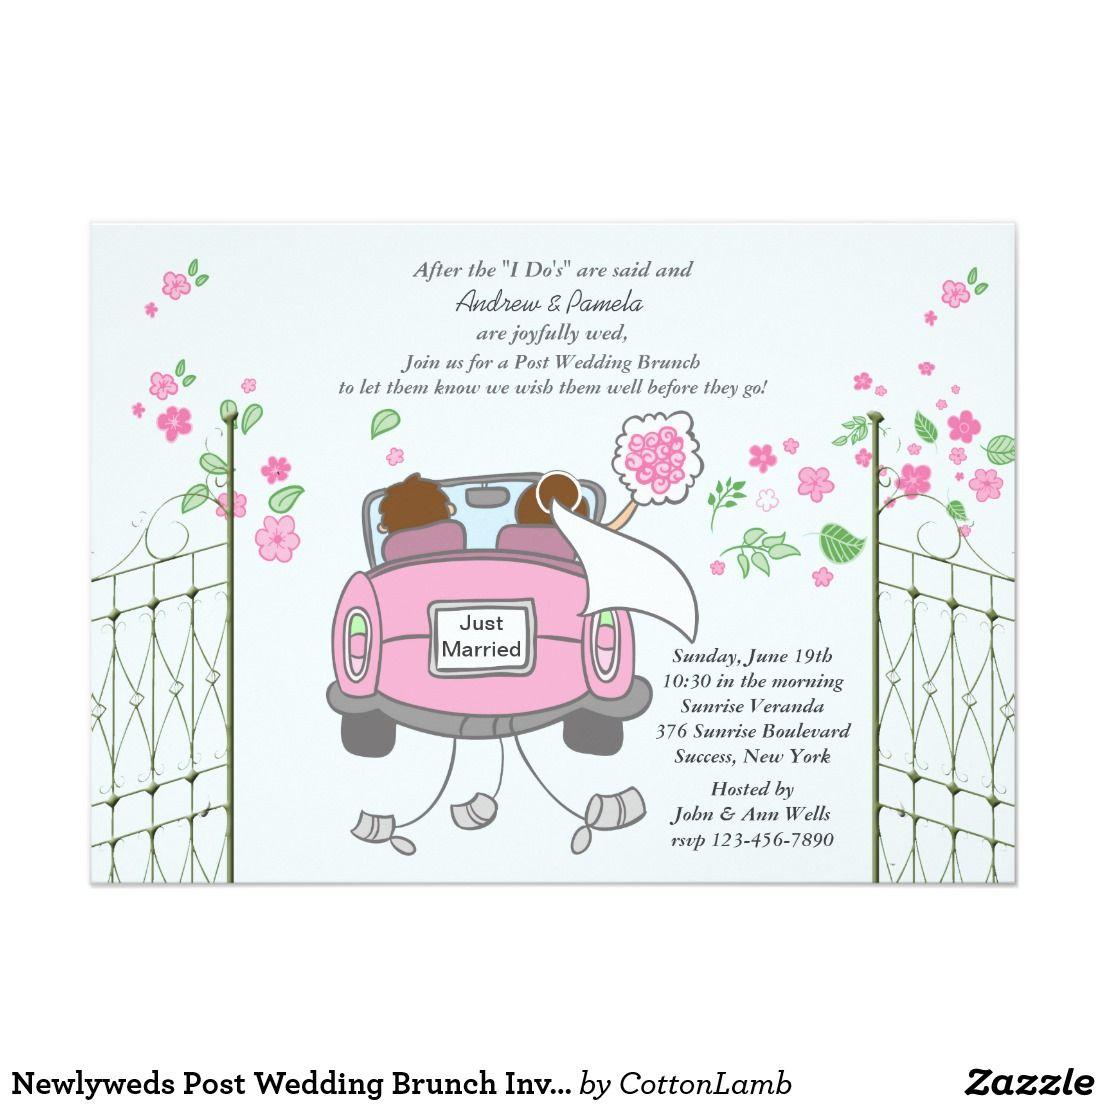 Newlyweds Post Wedding Brunch Invitation | Wedding: Just Married ...